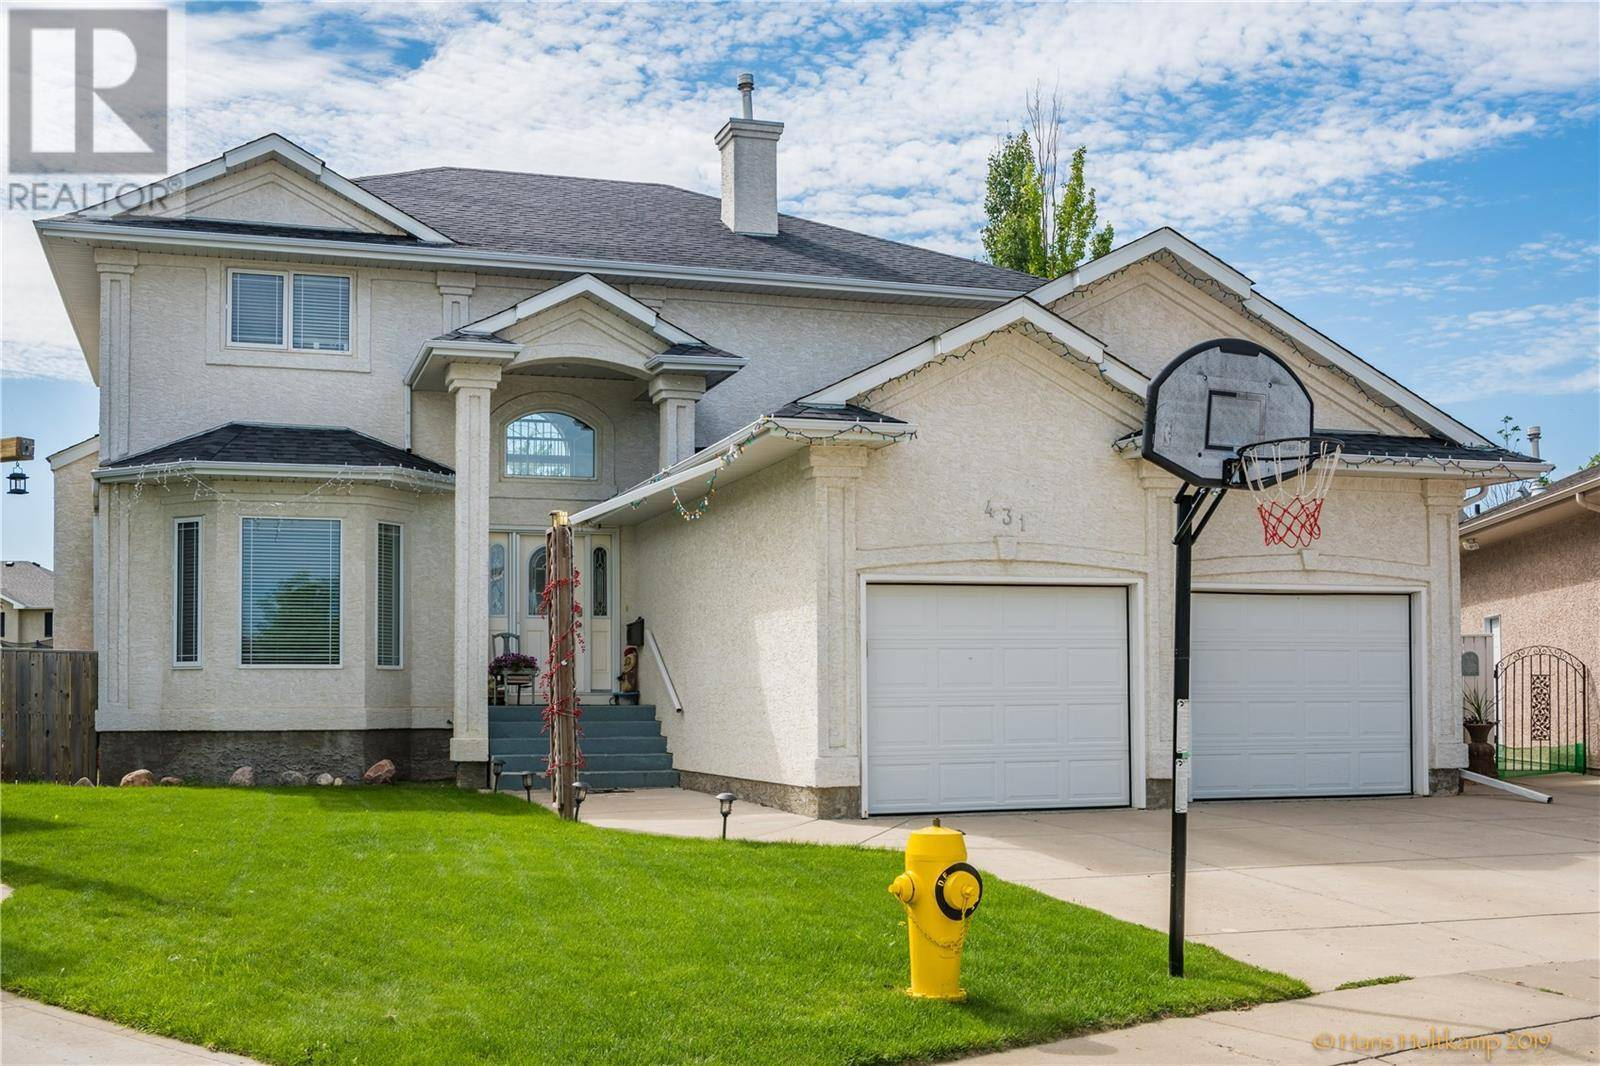 House for sale at 431 Blackburn Ter  Saskatoon Saskatchewan - MLS: SK781945